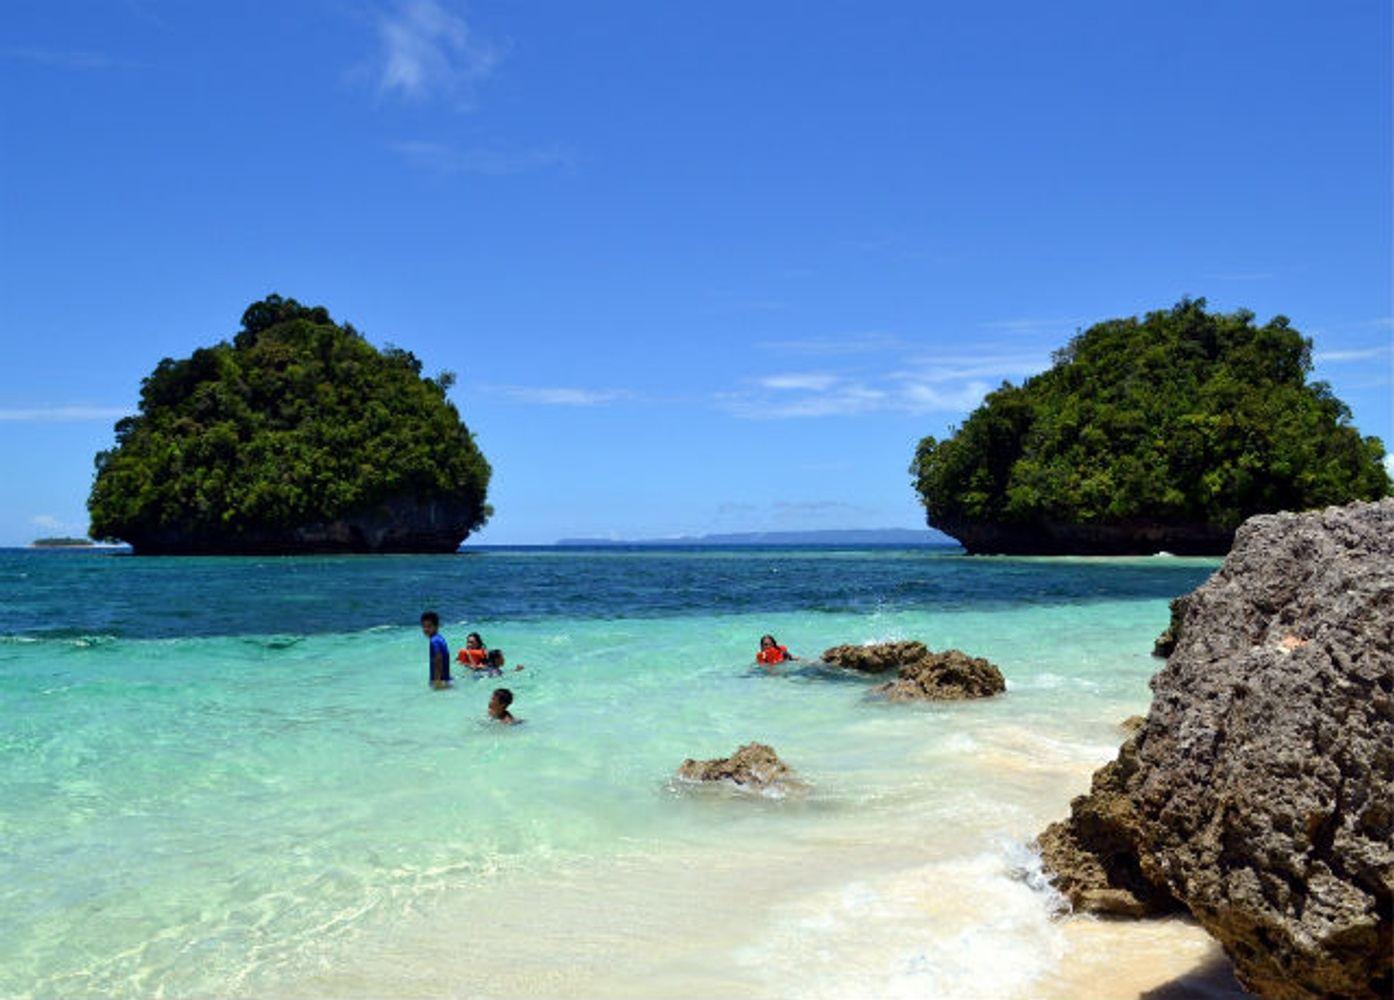 [TEST TRIP] Island Hopping